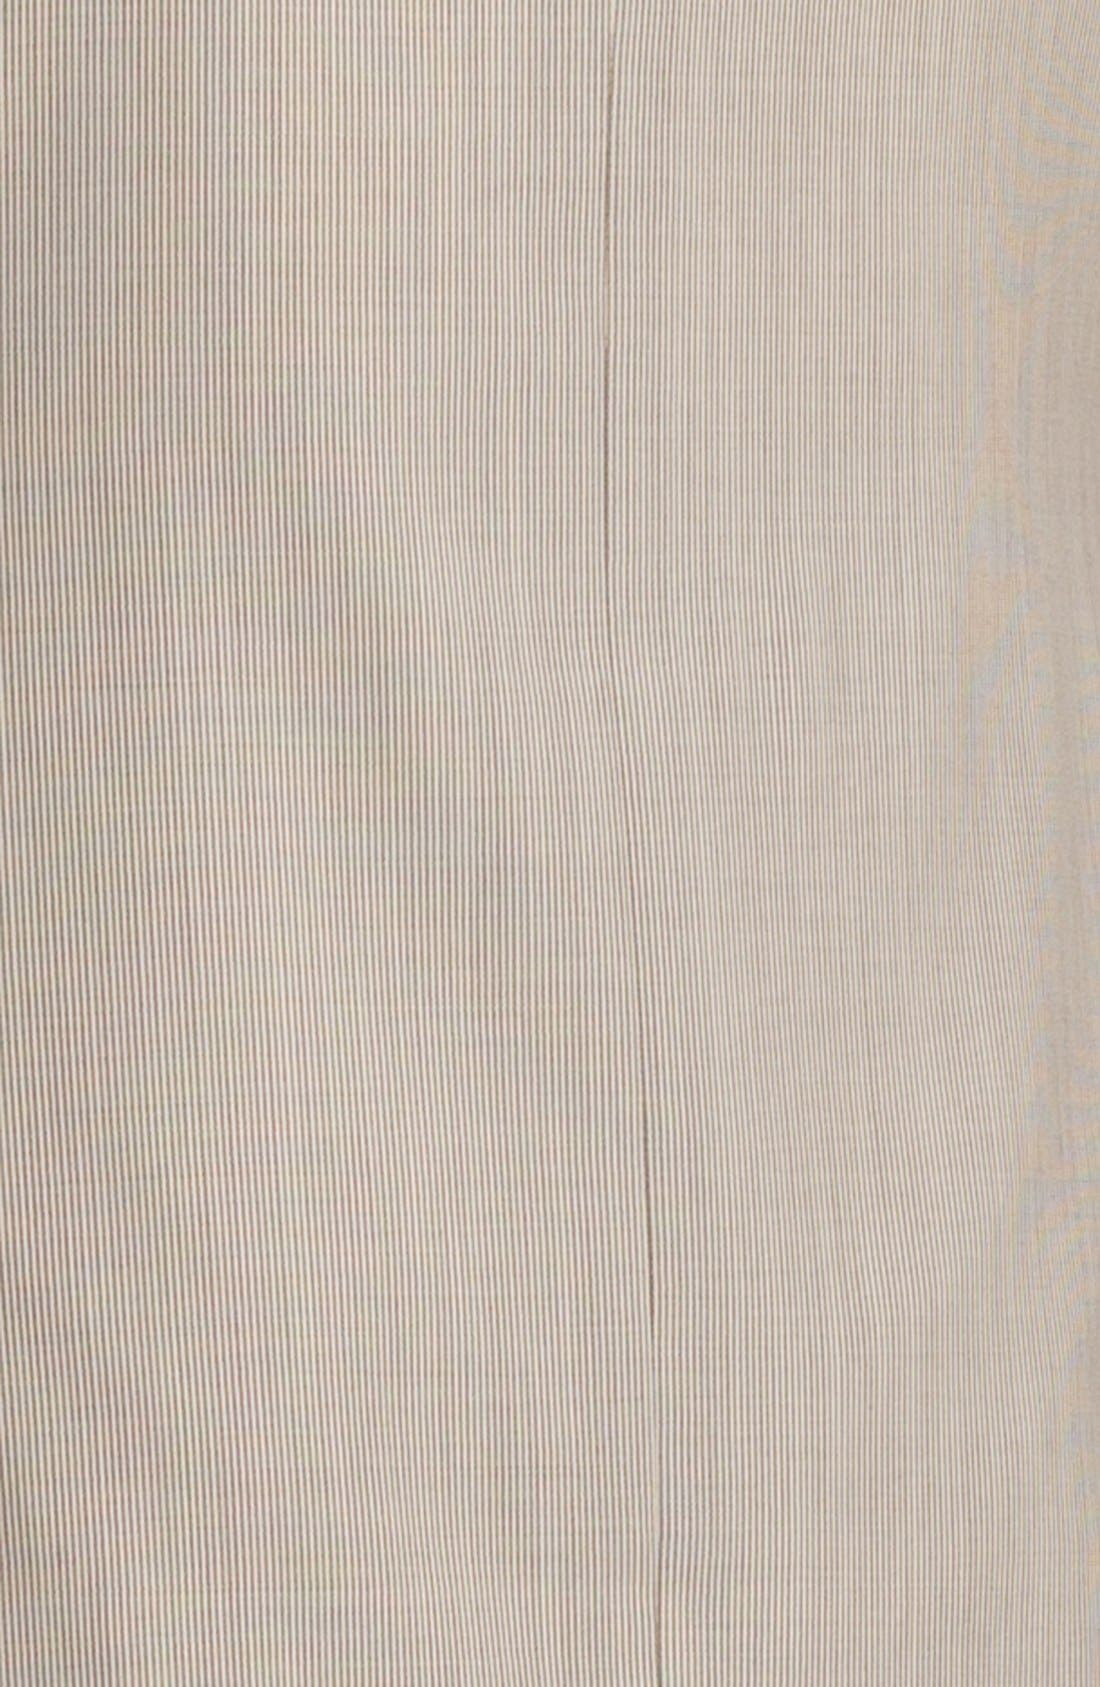 Alternate Image 2  - Joseph Abboud Trim Fit Stripe Wool Suit